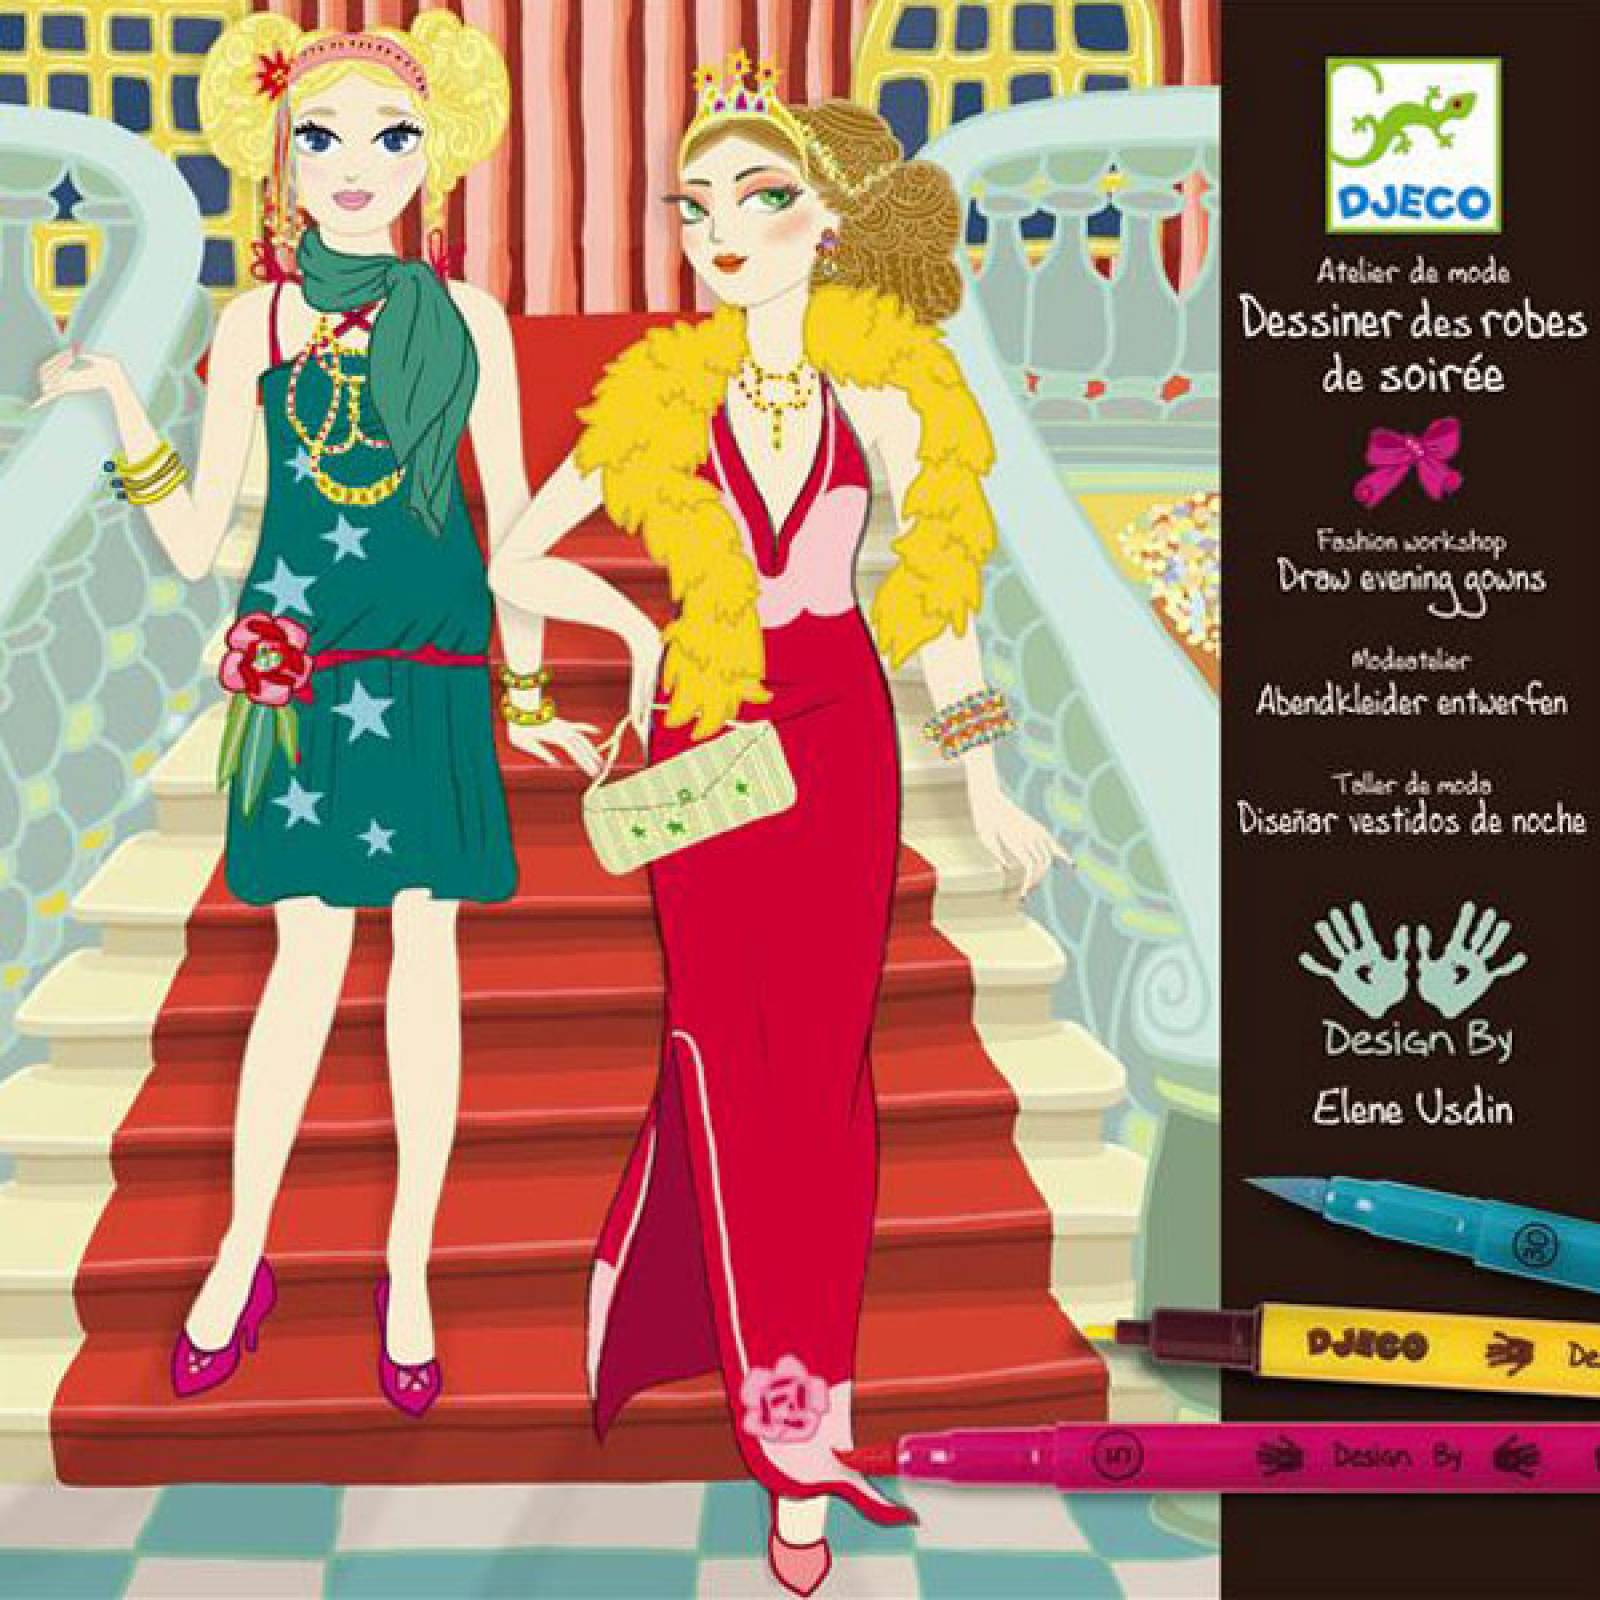 Dress Evening Gowns Workshop Art Set Djeco 9-13yrs. thumbnails